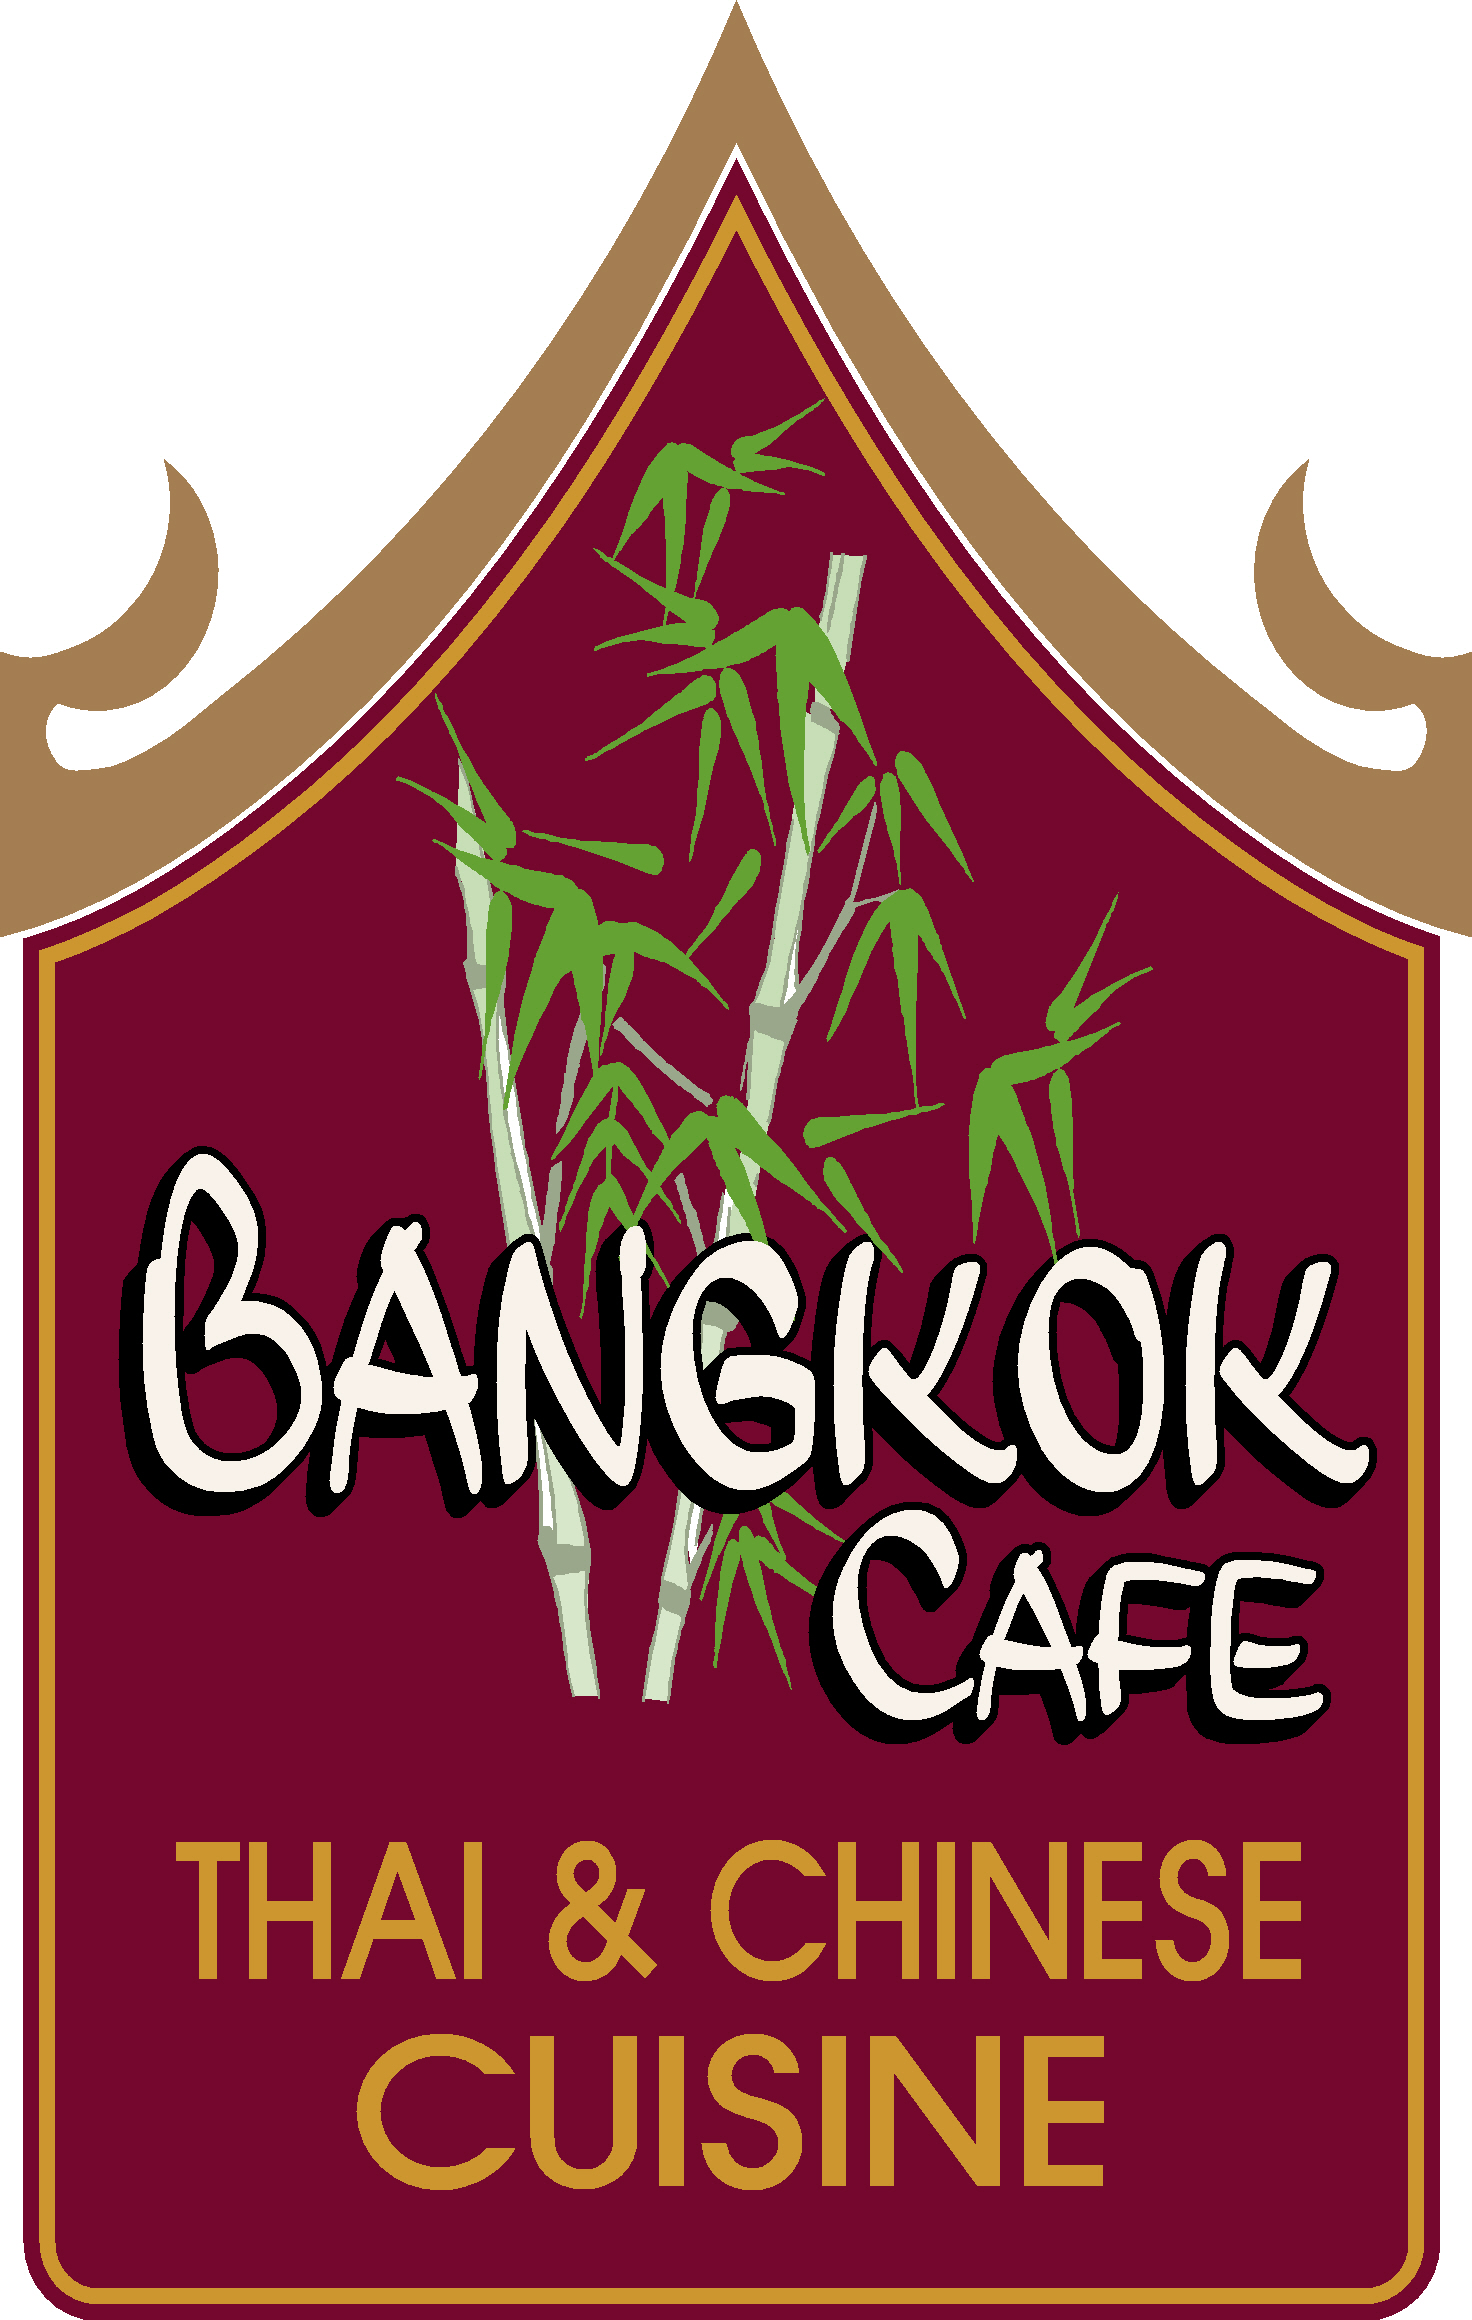 bangkok+cafe+logo.JPG